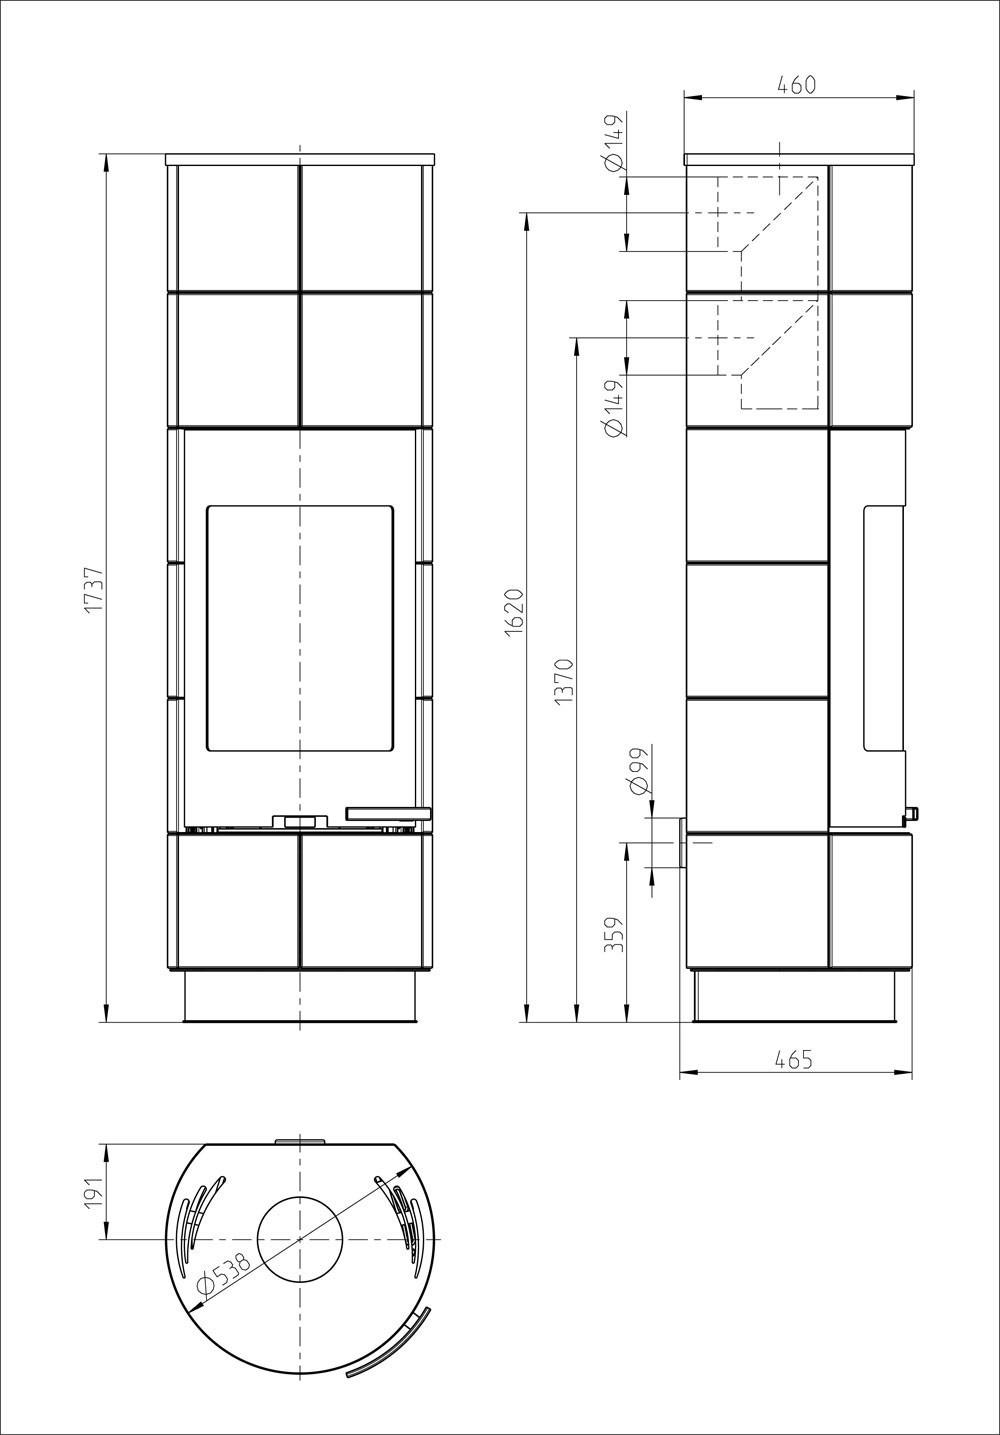 Kaminofen Thorma Delia / Cadiz Plus Speicher raumluftunab. weiss 7,5kW Bild 3